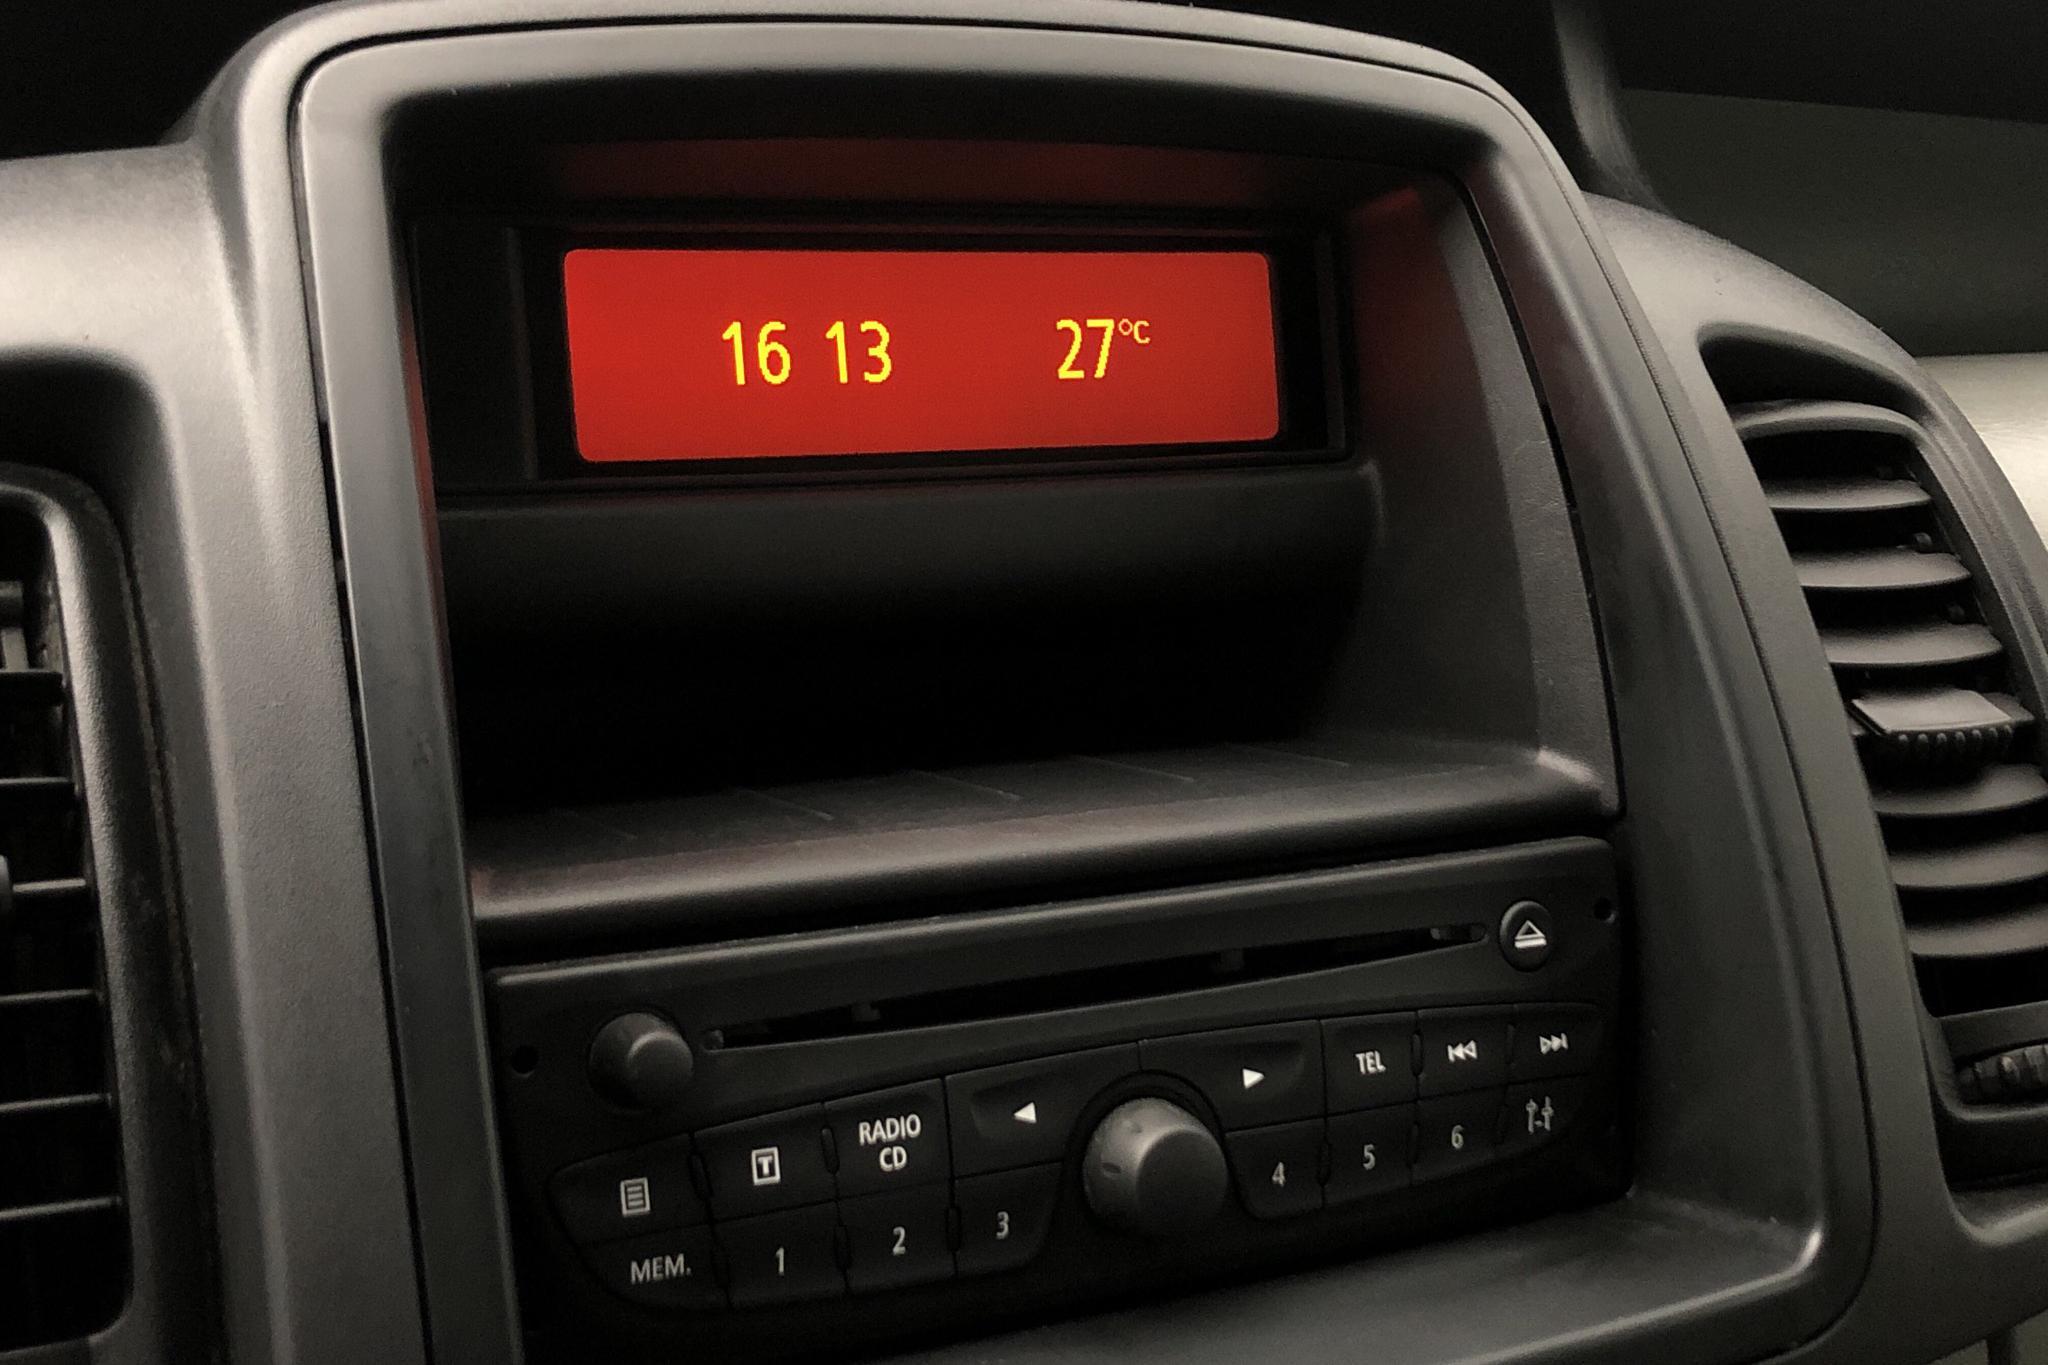 Nissan Primastar 2.0 dCi (114hk) - 168 680 km - Manual - white - 2014